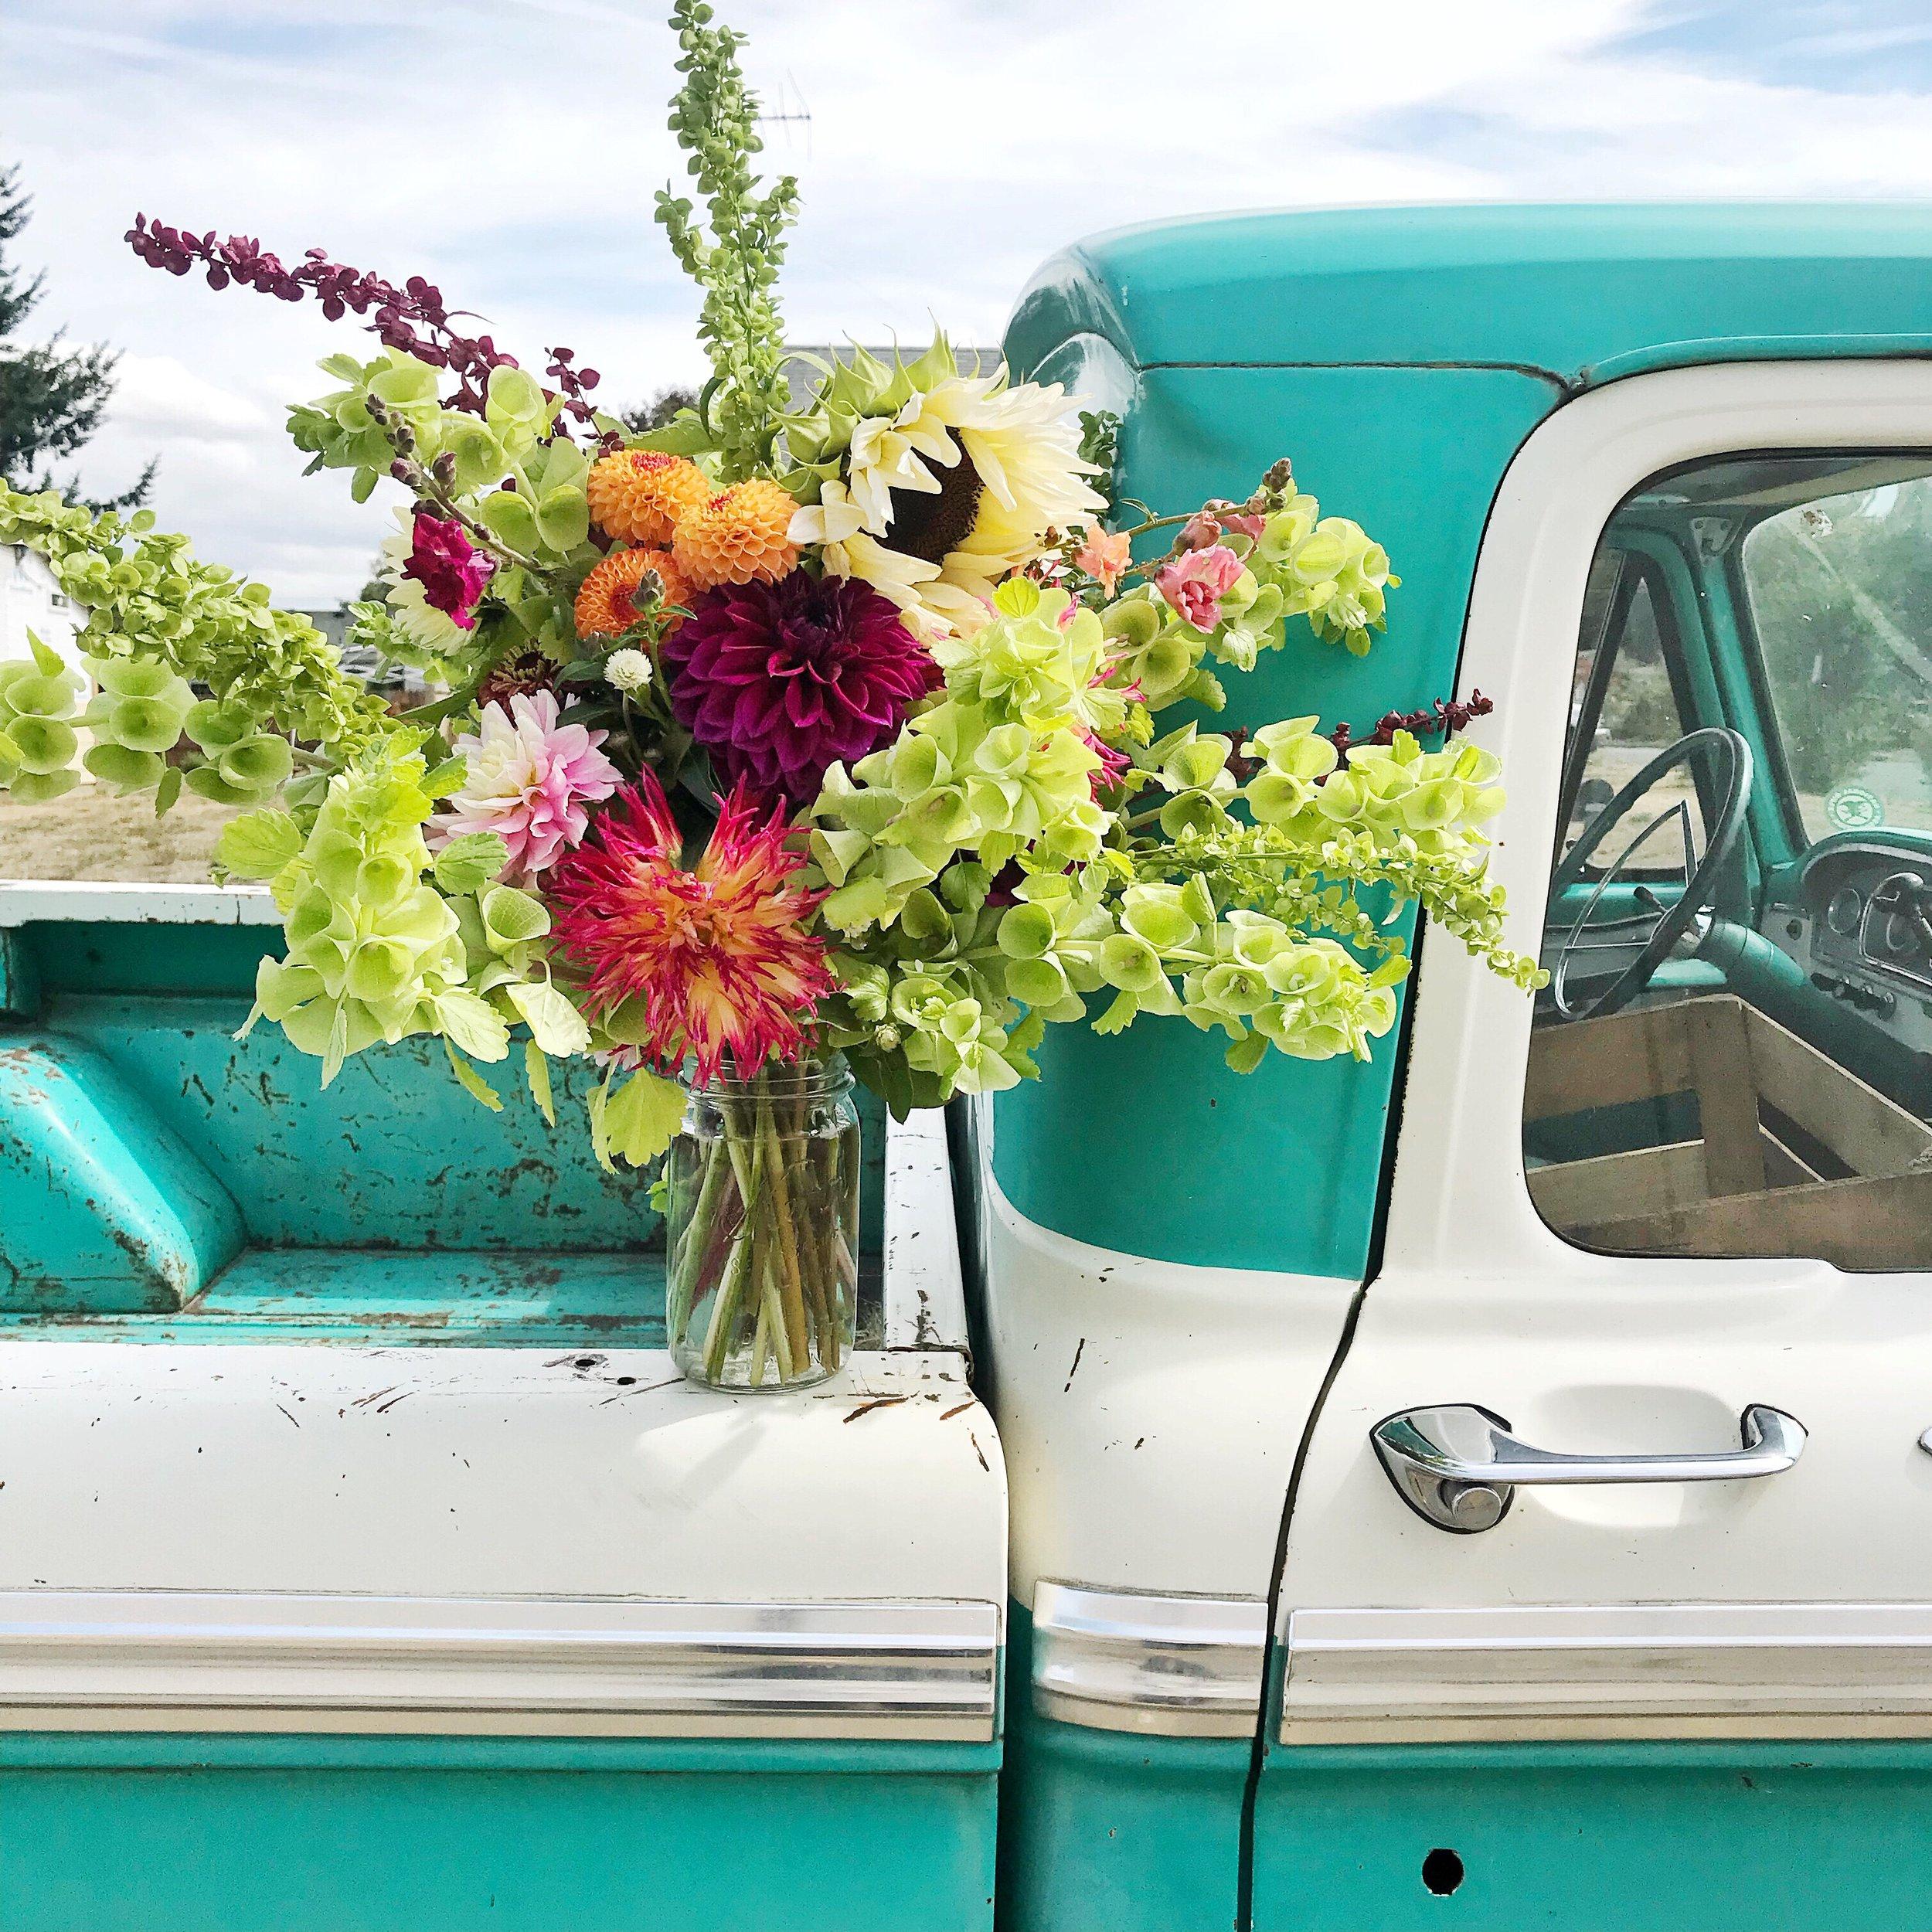 Farm Truck Flowers-Clementine